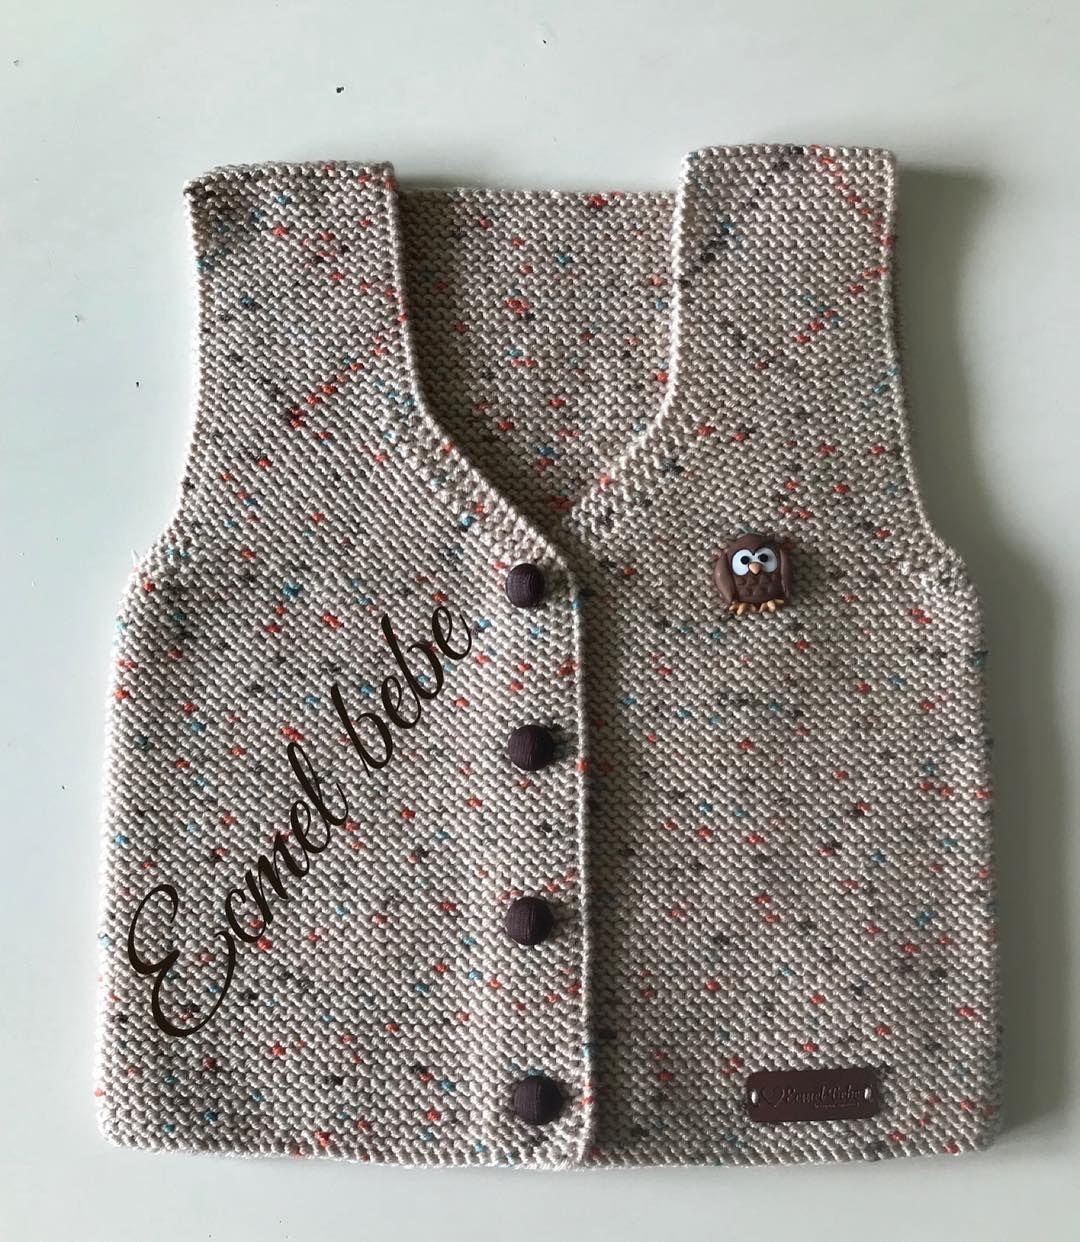 Otomatik Alternatif Metin Yok Baby Knitting Baby Knitting Patterns Baby Jacket